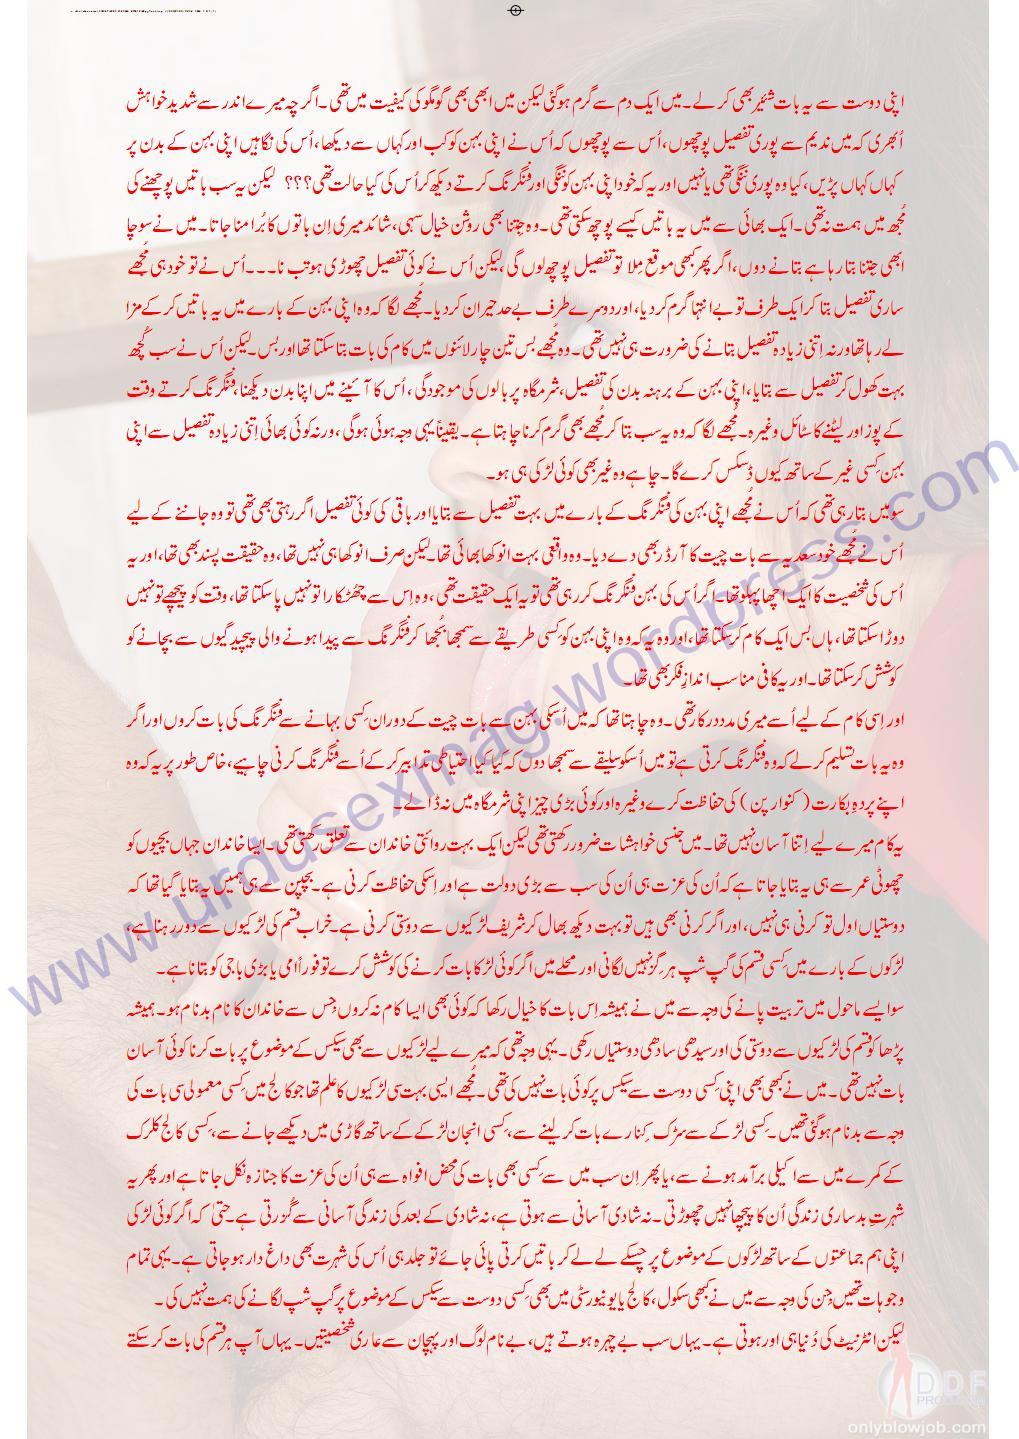 Sexy Urdu Stories: Dosti aisa Naaaaaaaata